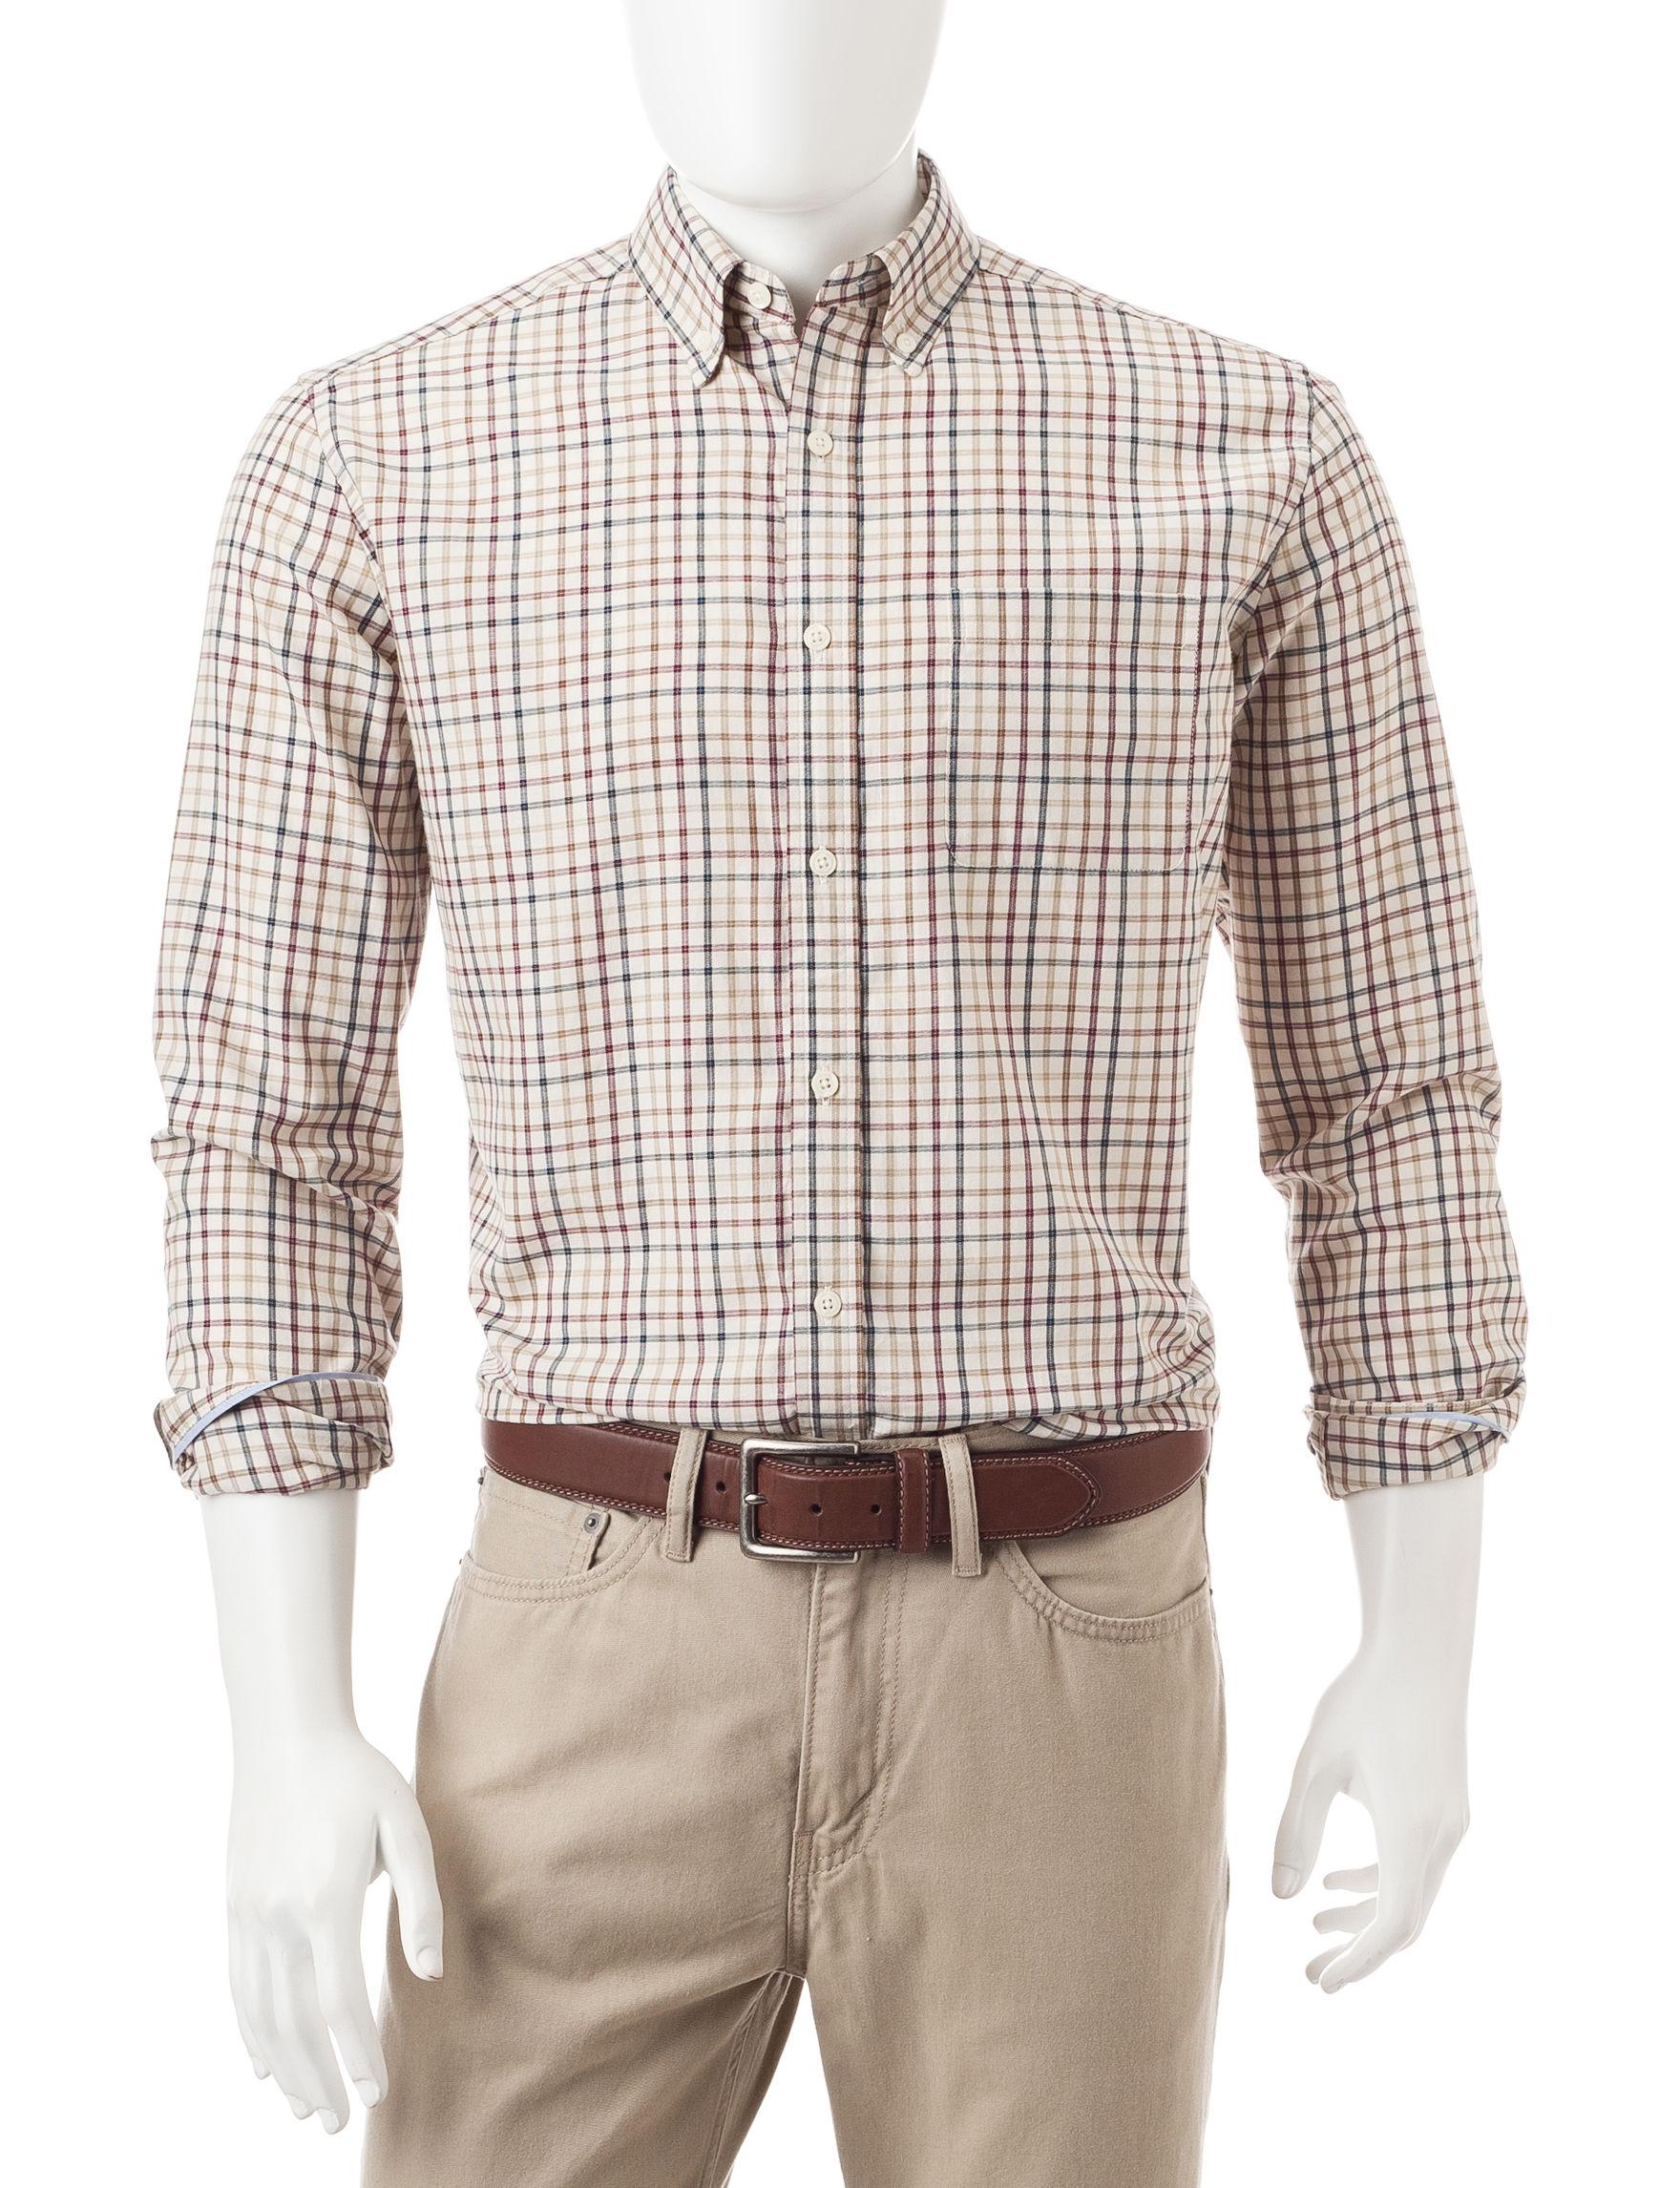 U.S. Polo Assn. Ivory Casual Button Down Shirts